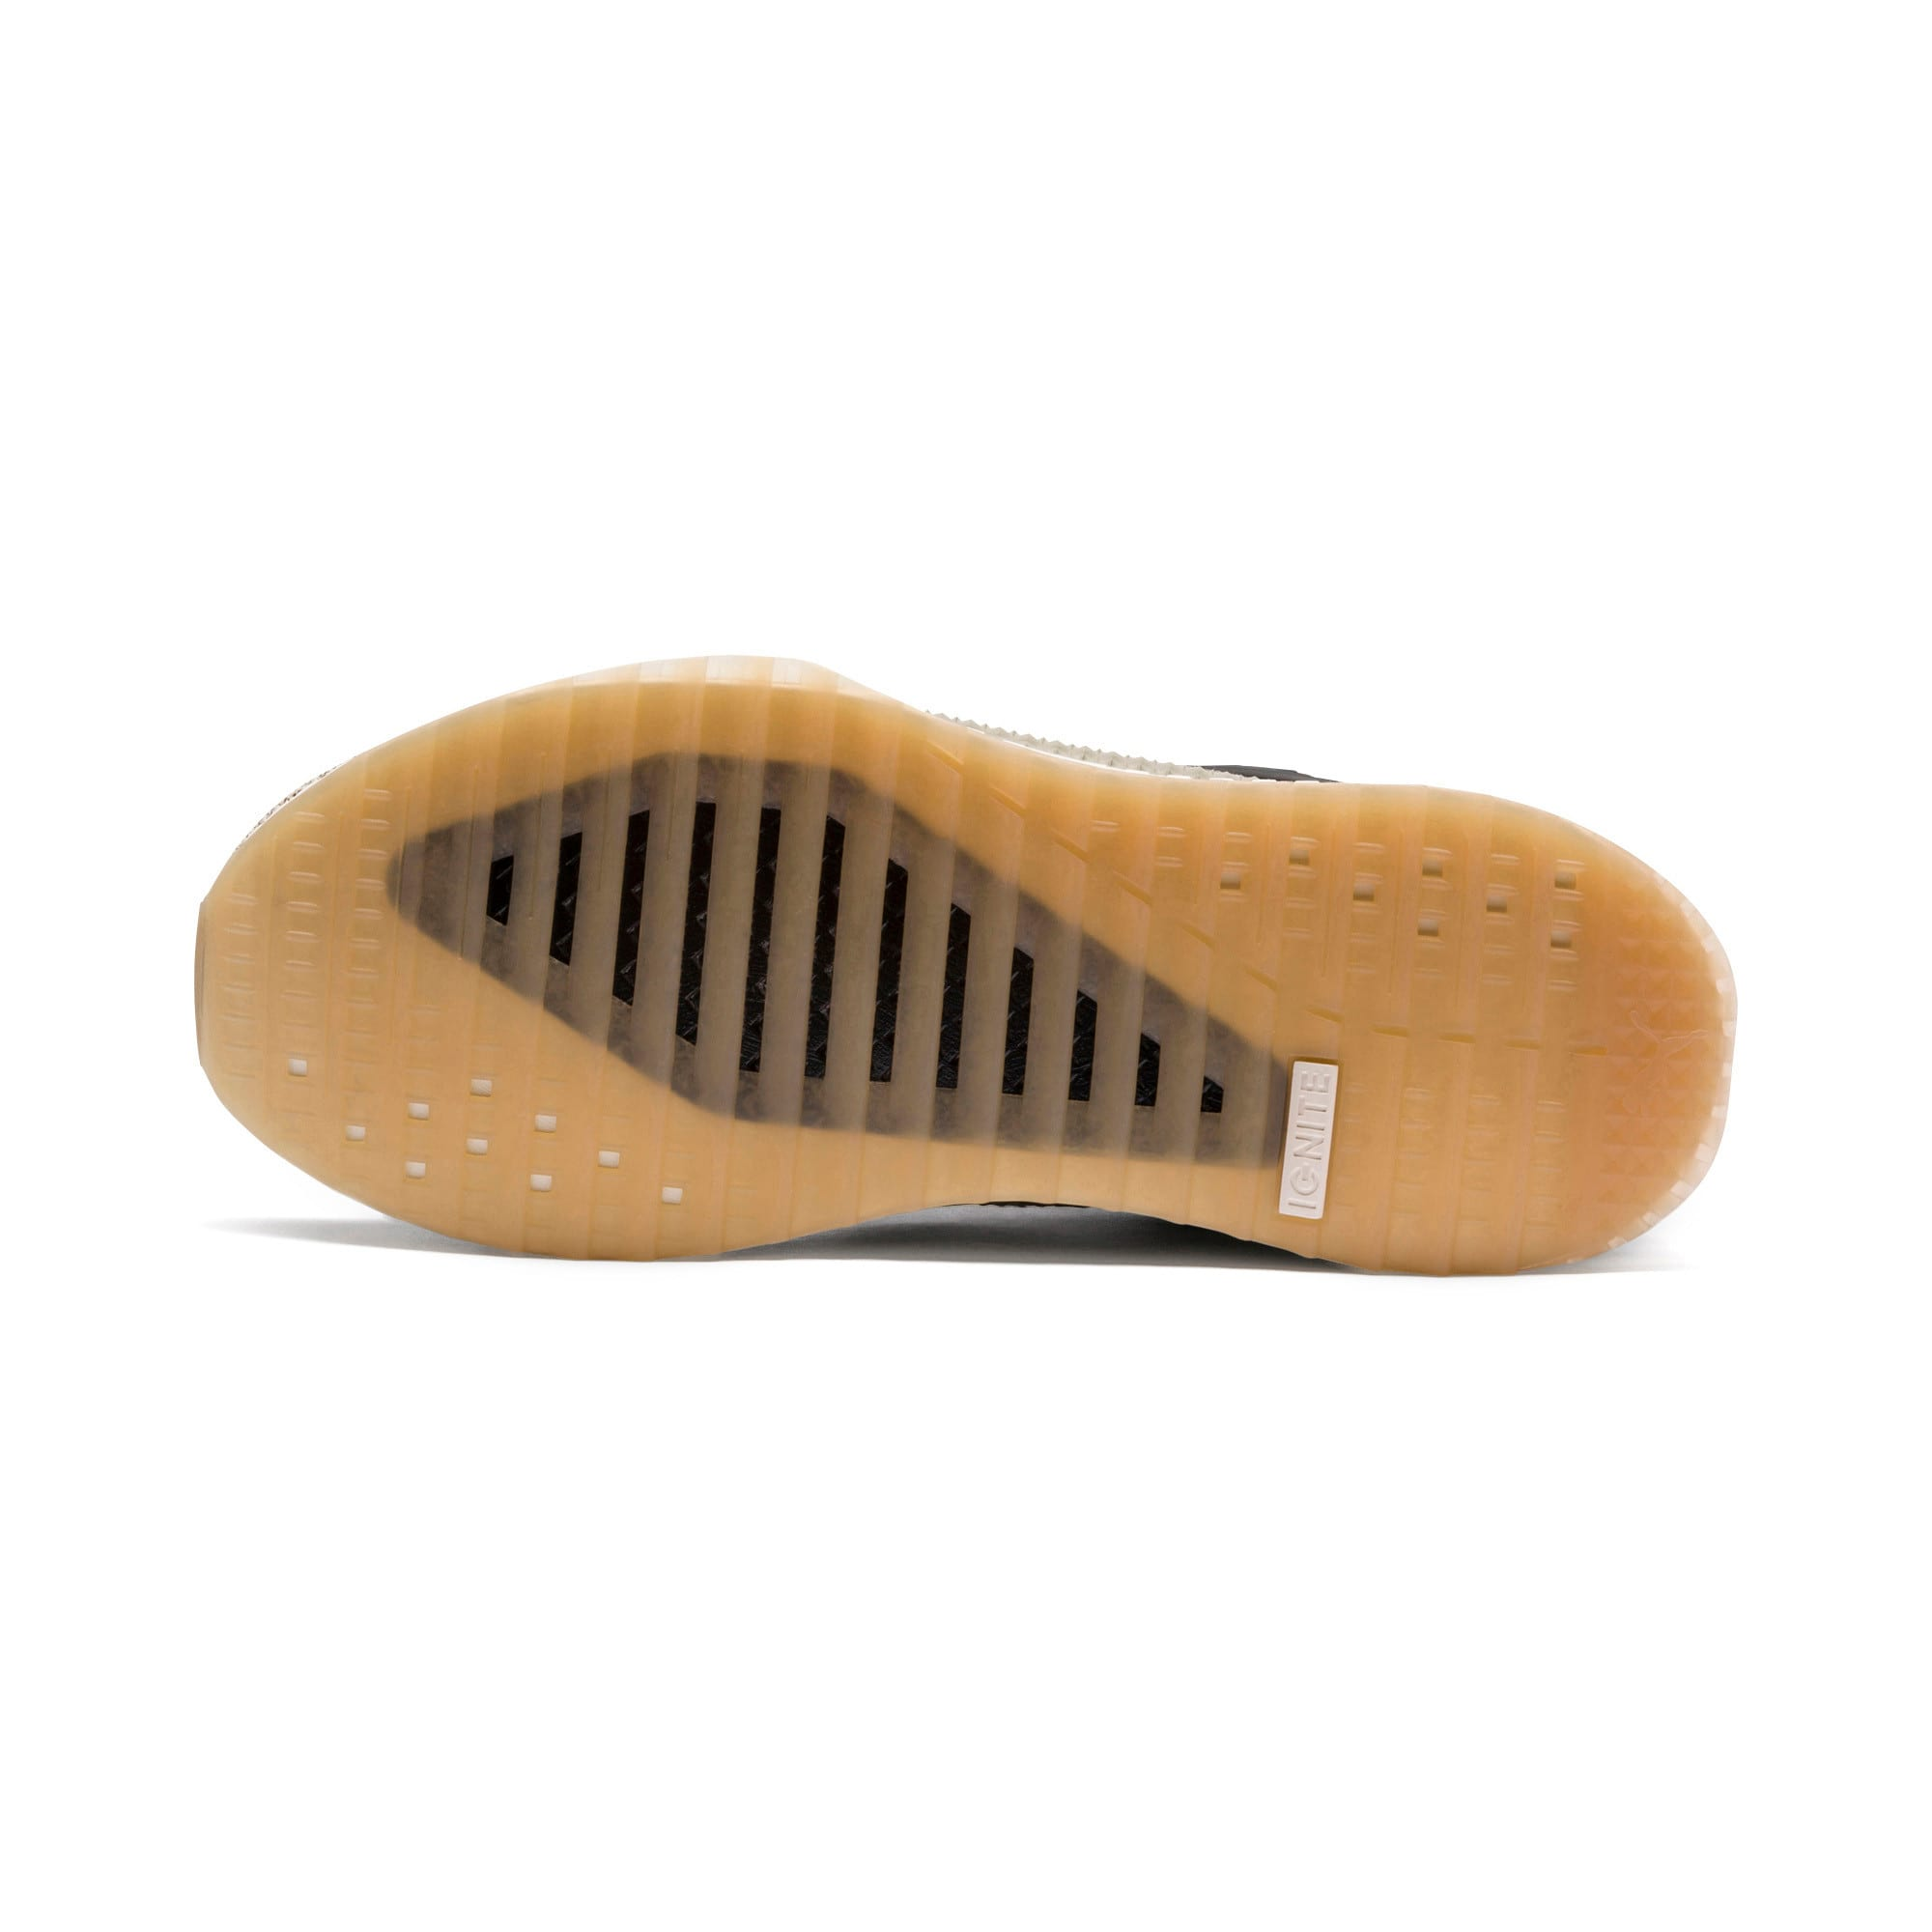 Thumbnail 3 of TSUGI Cage Premium Sneakers, Elephant Skin-Puma Black, medium